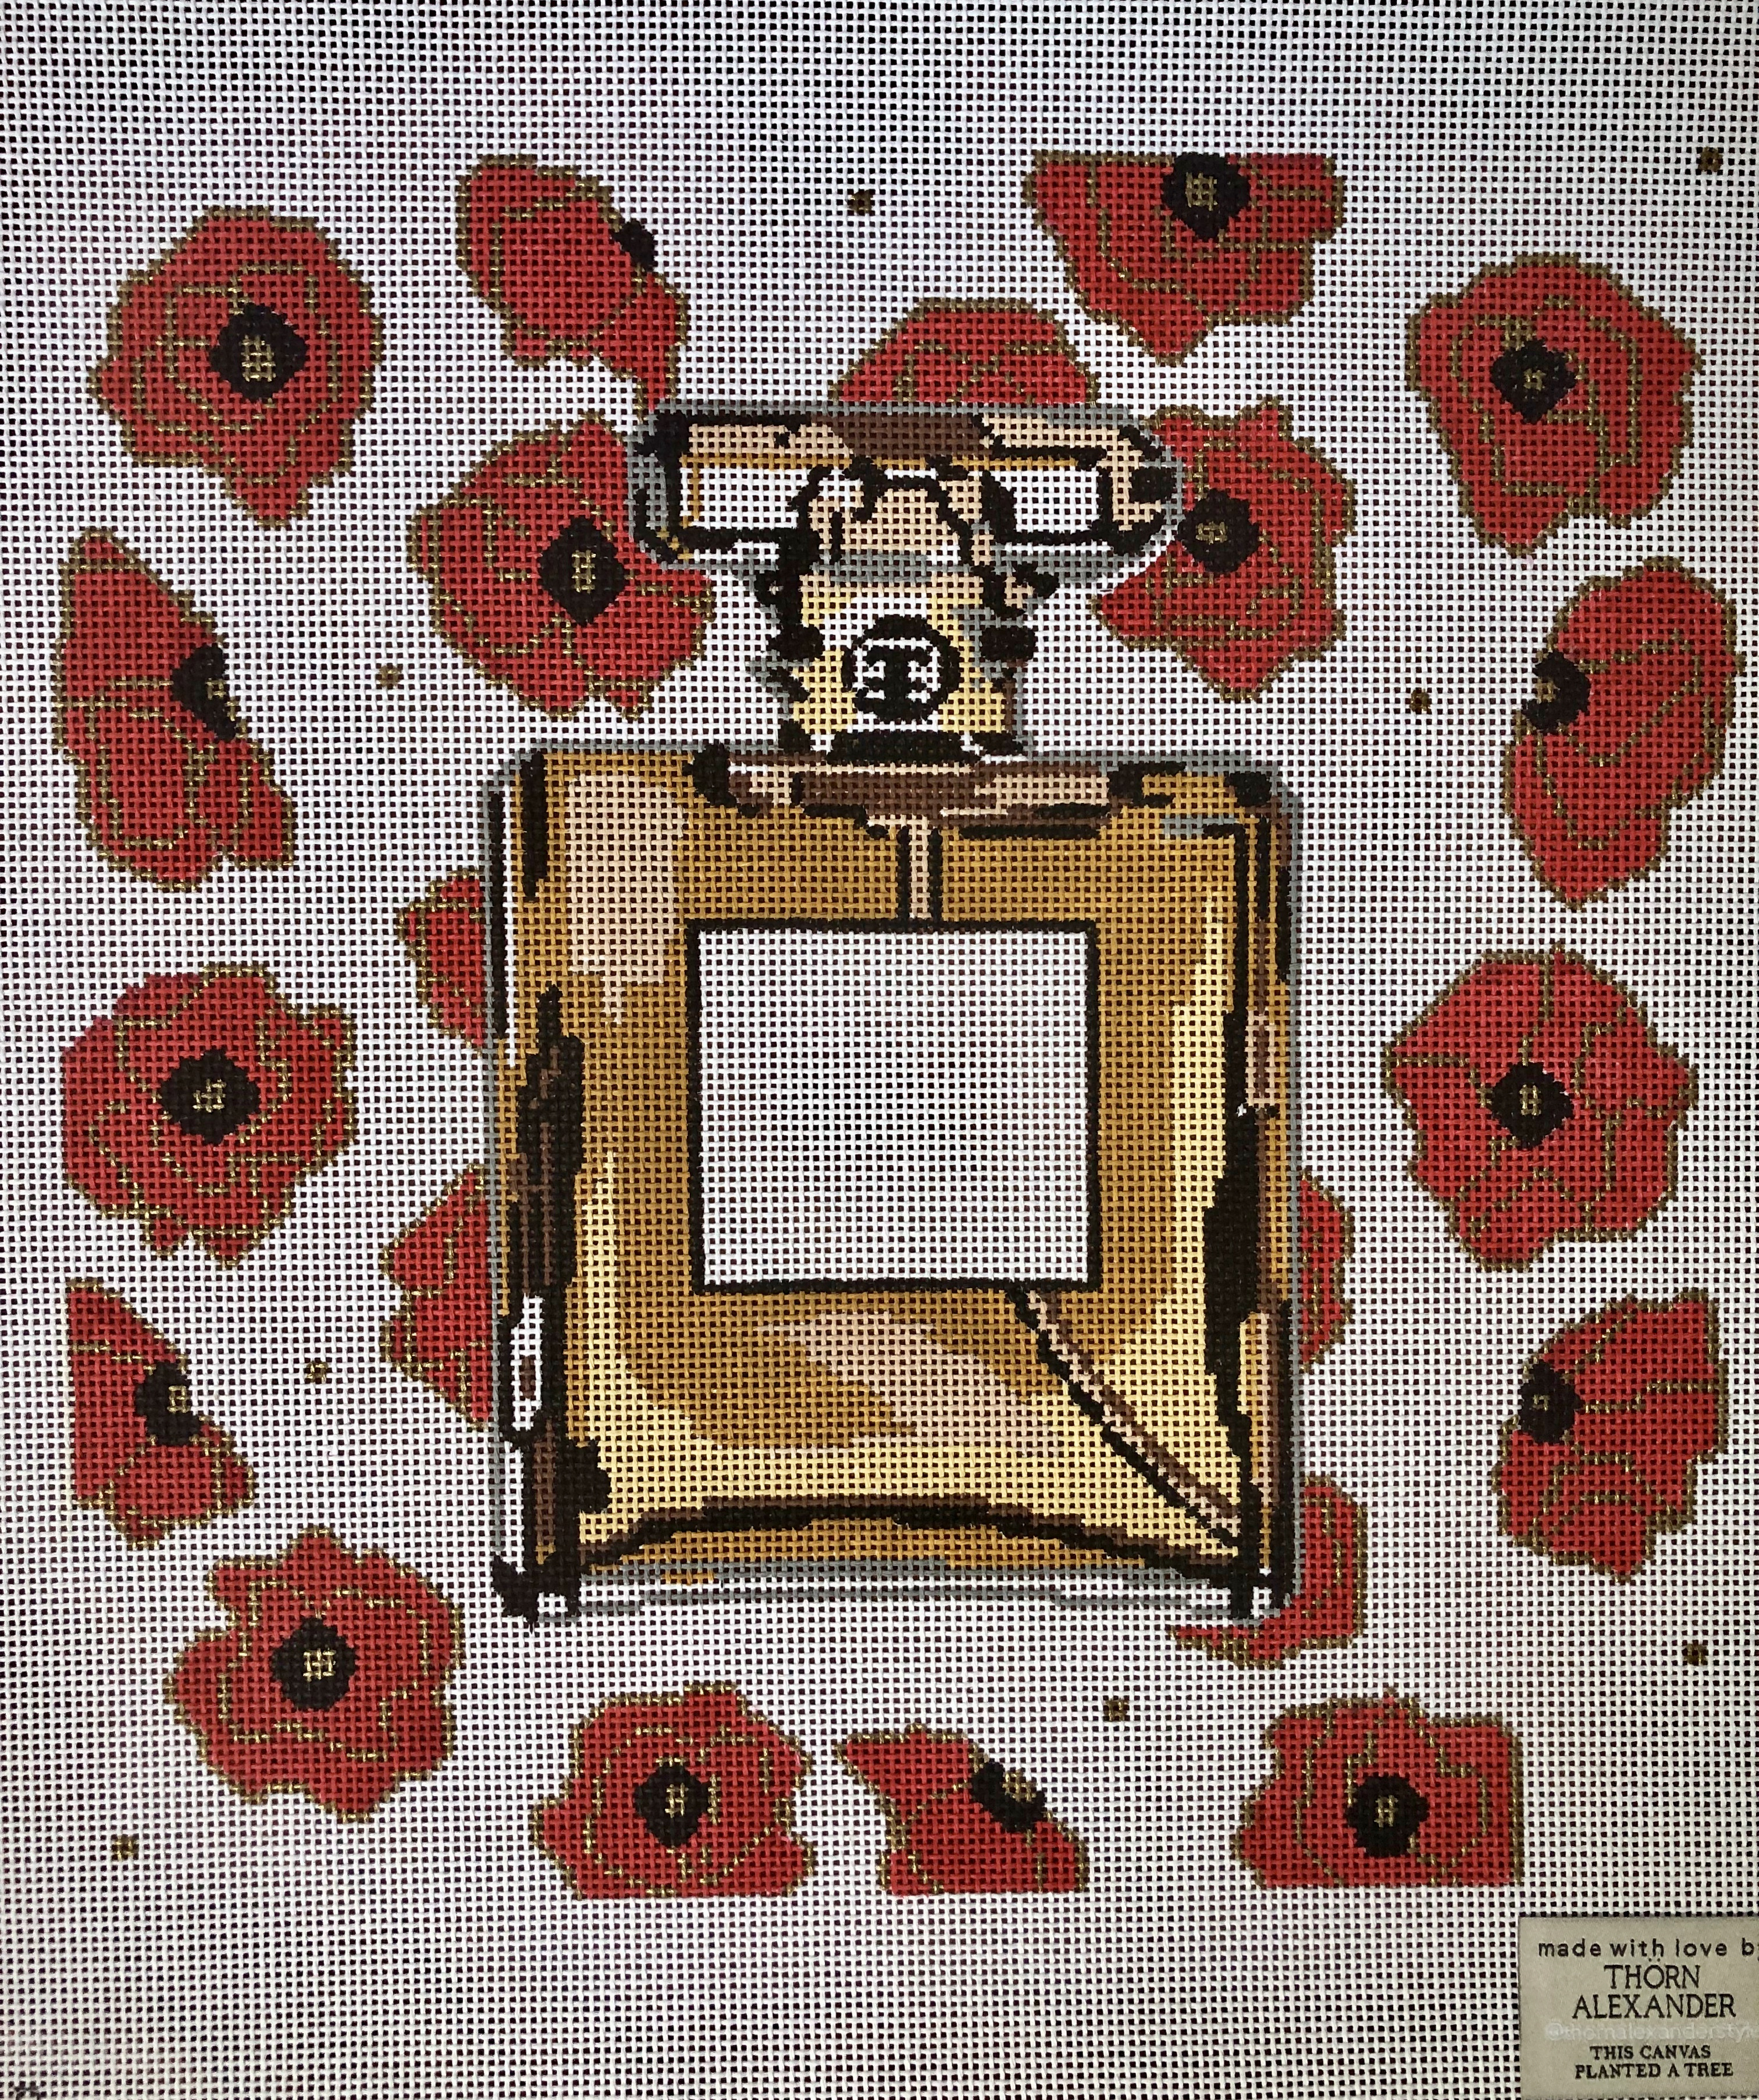 Thorn Alexander Poppy Perfume Bottle - Clean Version